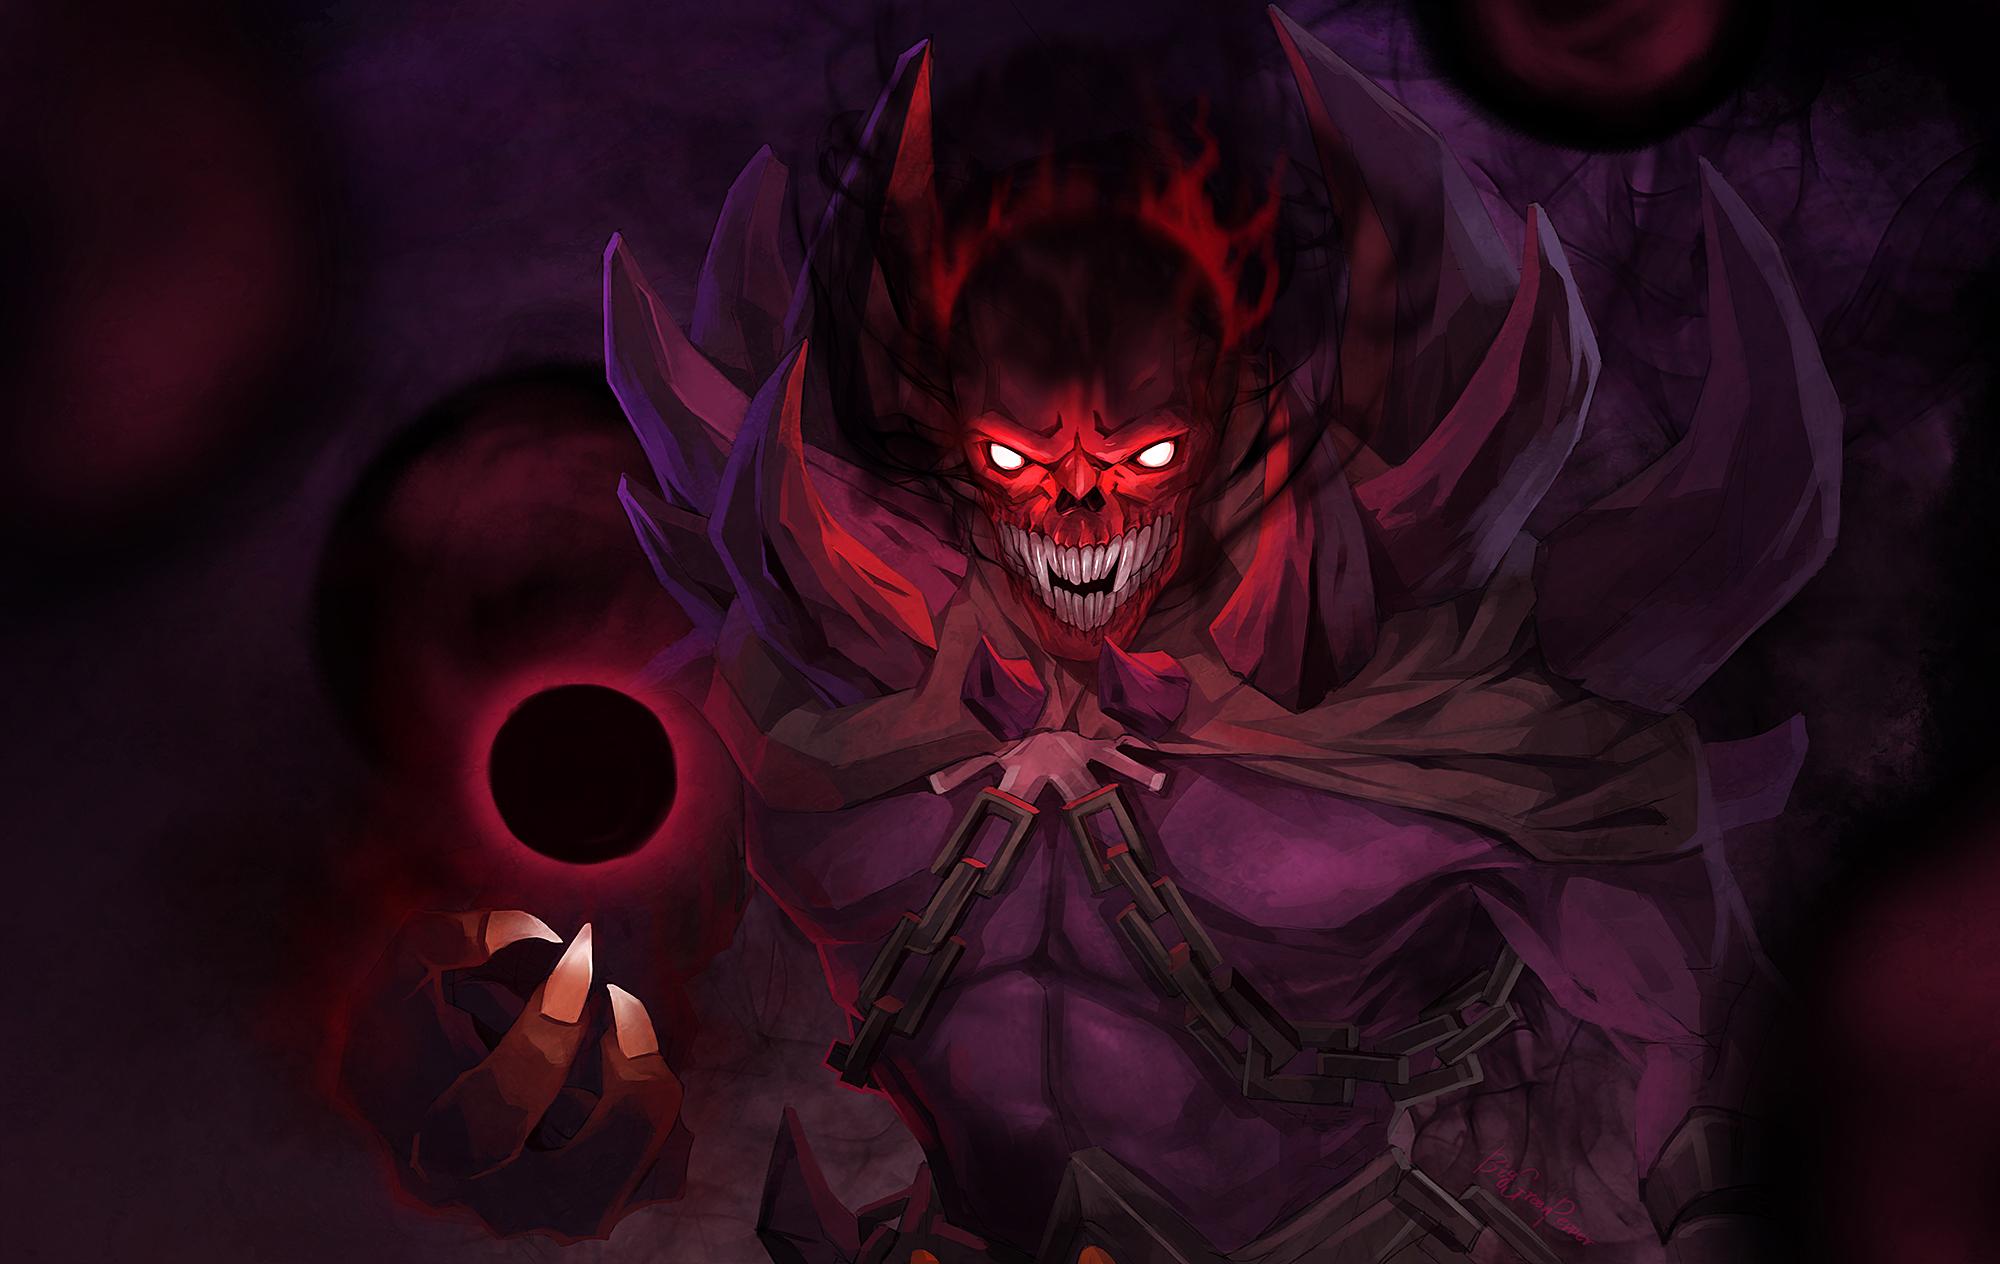 dota2 shadow demon by biggreenpepper on deviantart